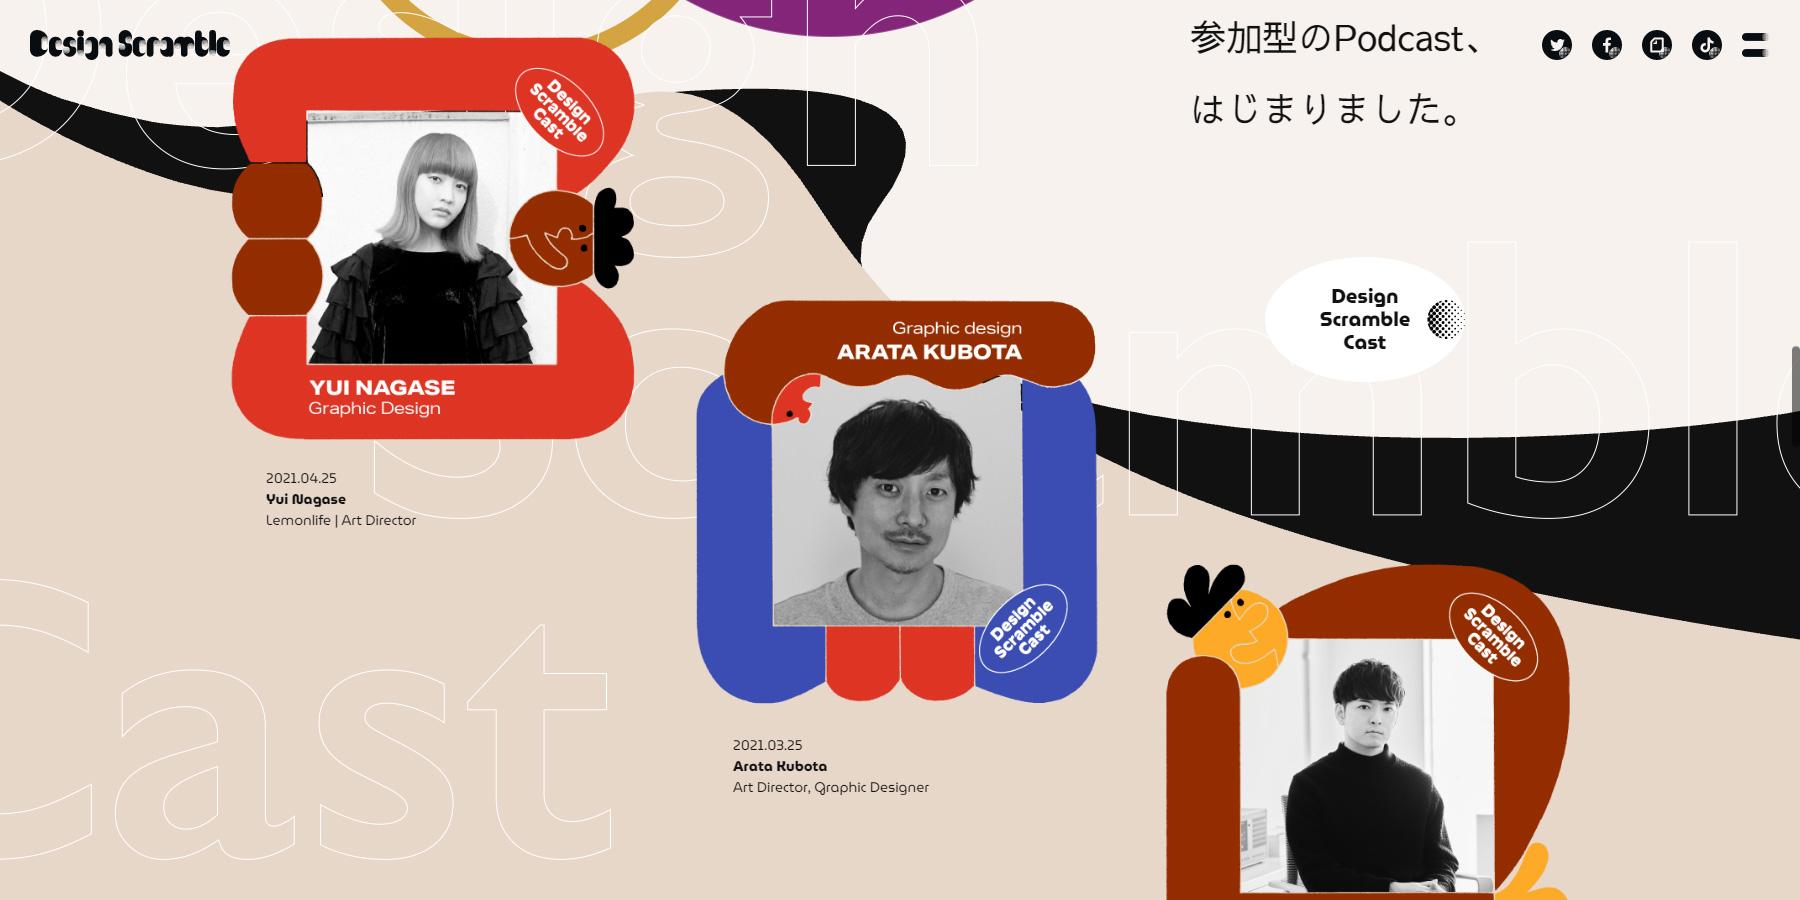 Design Scramble - Website of the Day